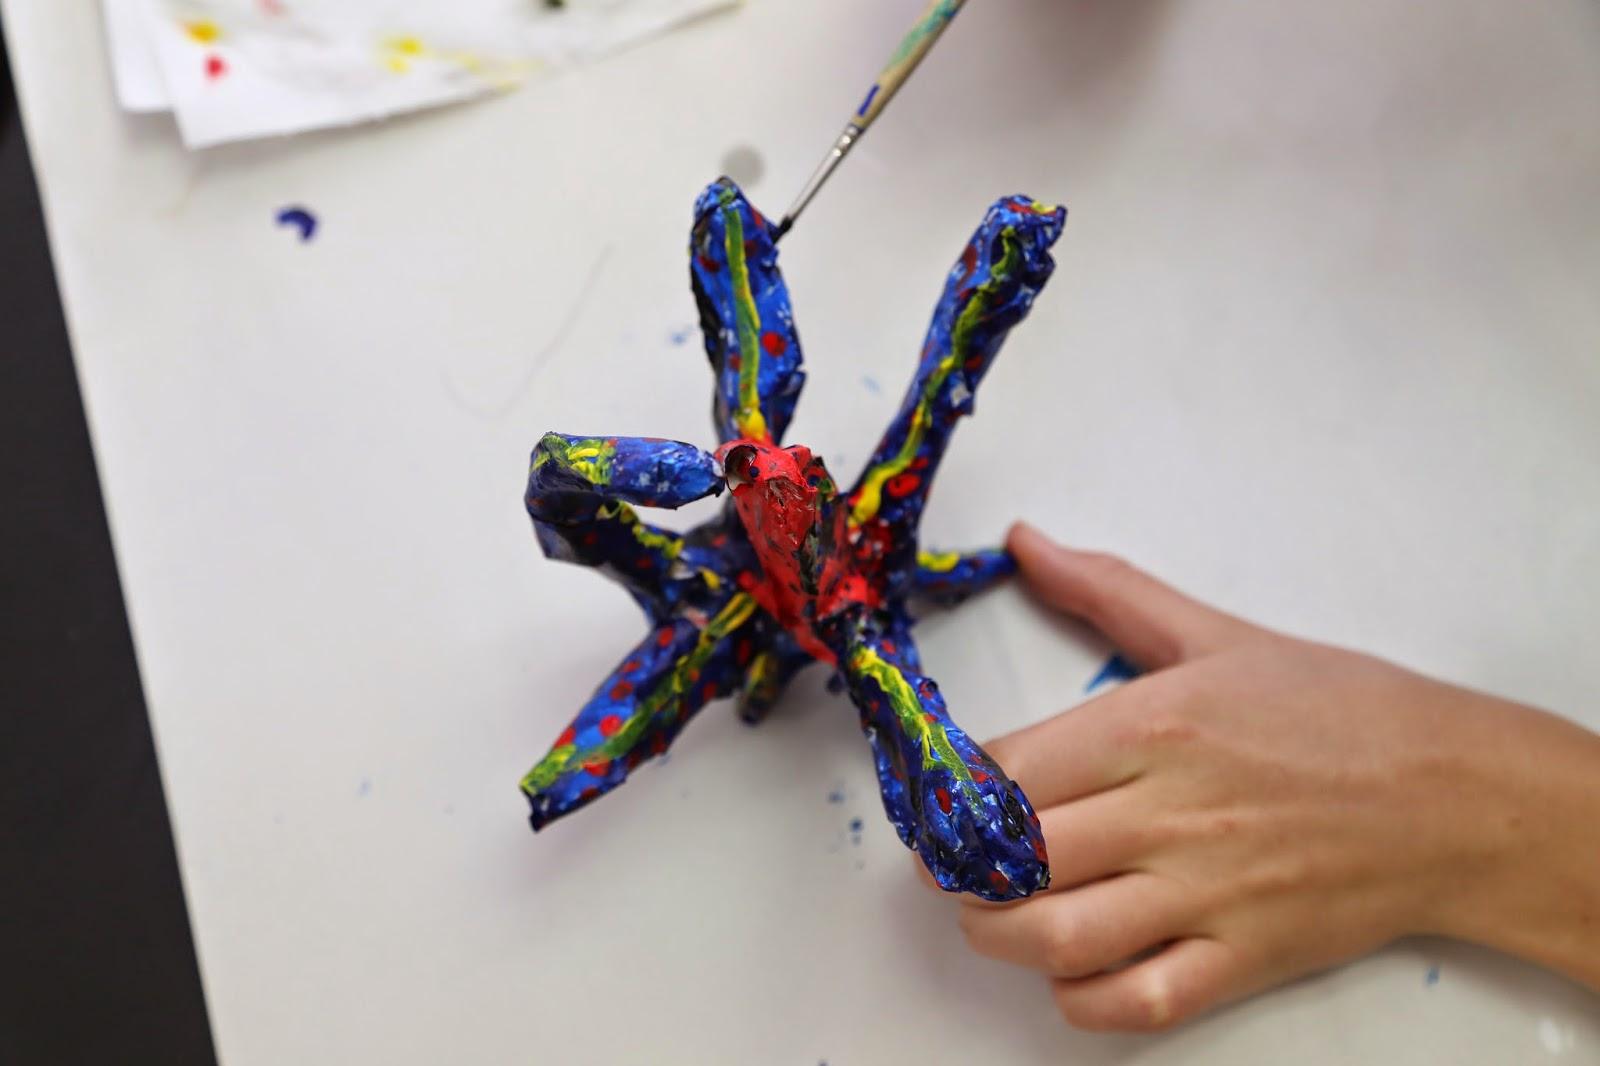 Grauer Art Alebrije painting 7th Grade Art